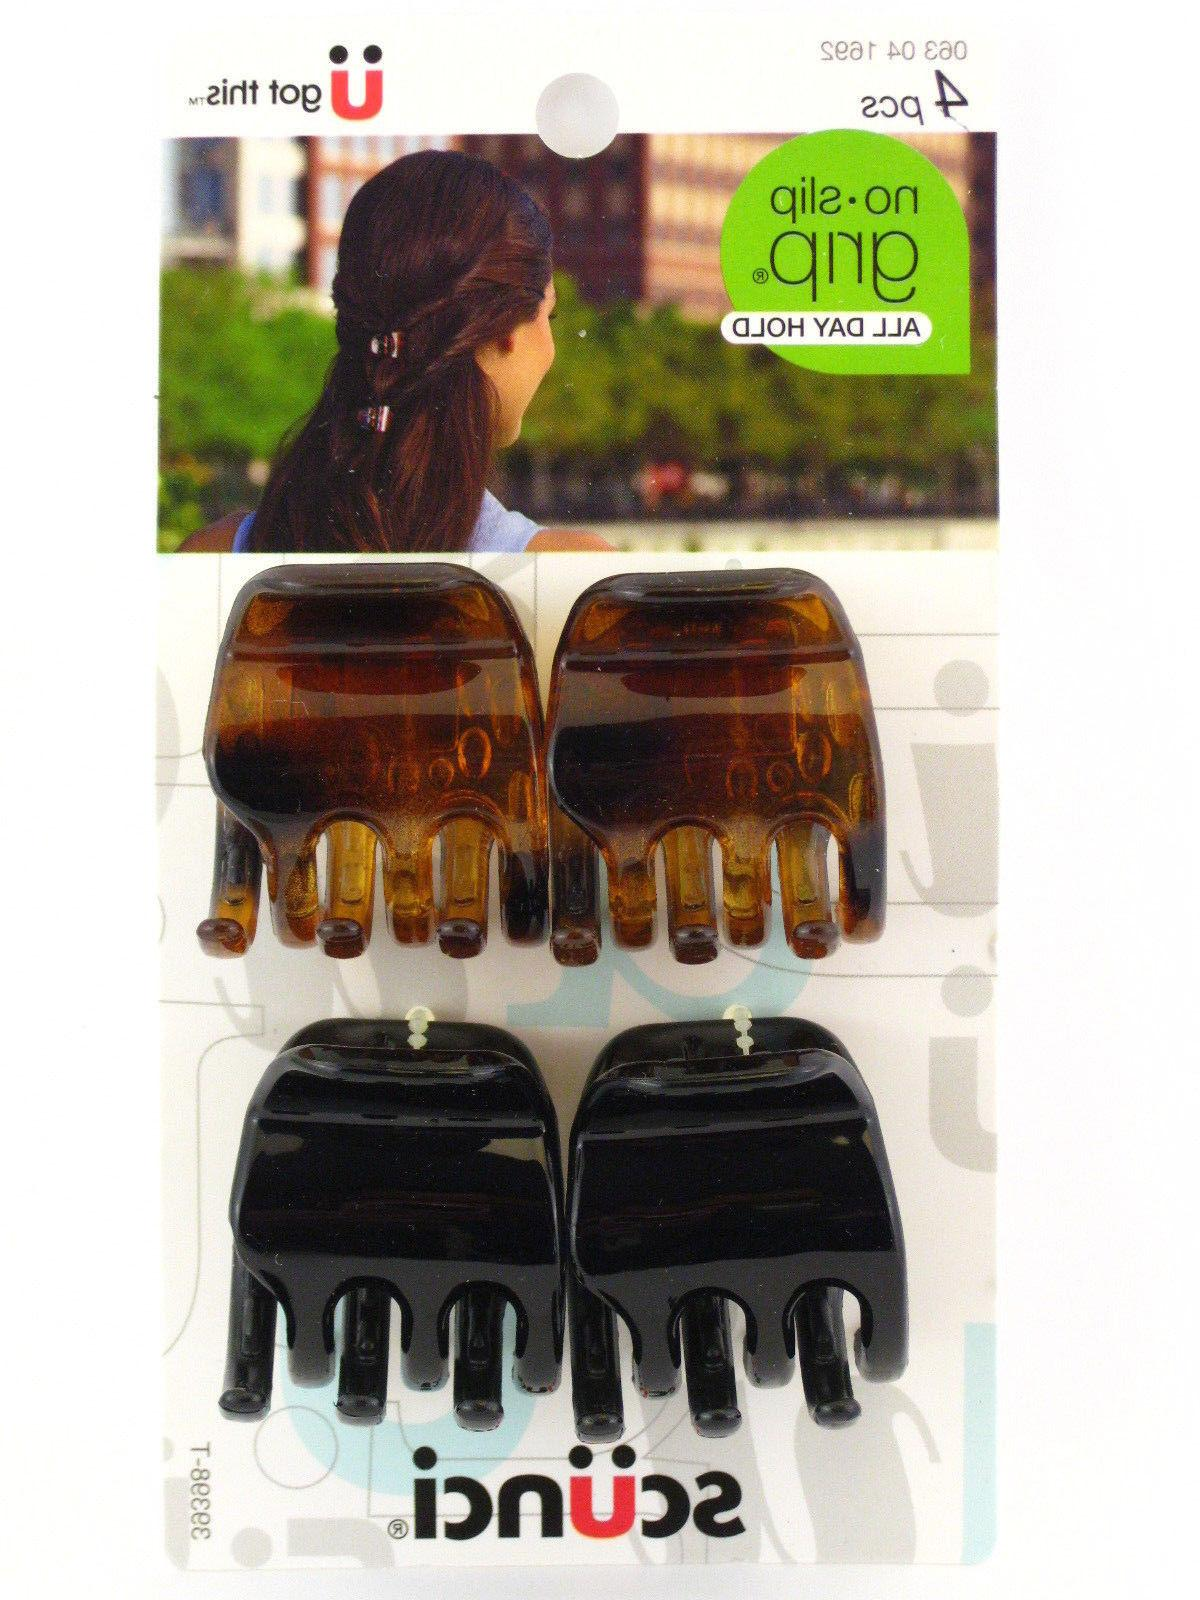 no slip grip jaw hair clips tortoise